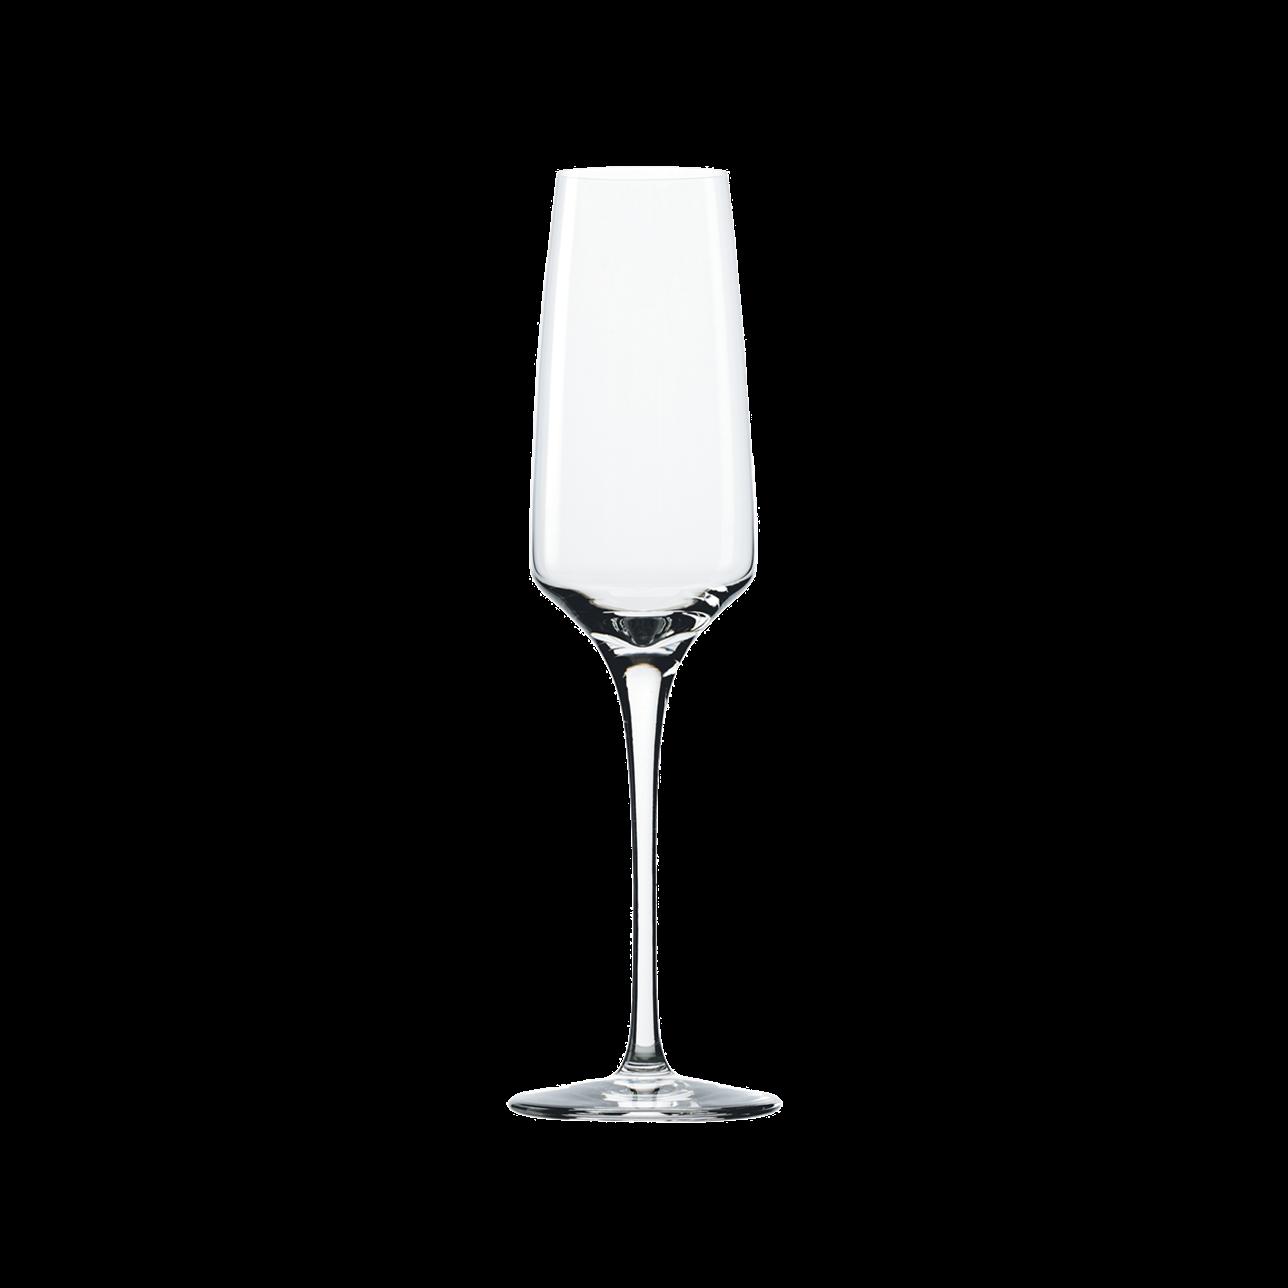 Sommelier Champagne Flute (Set of 4)